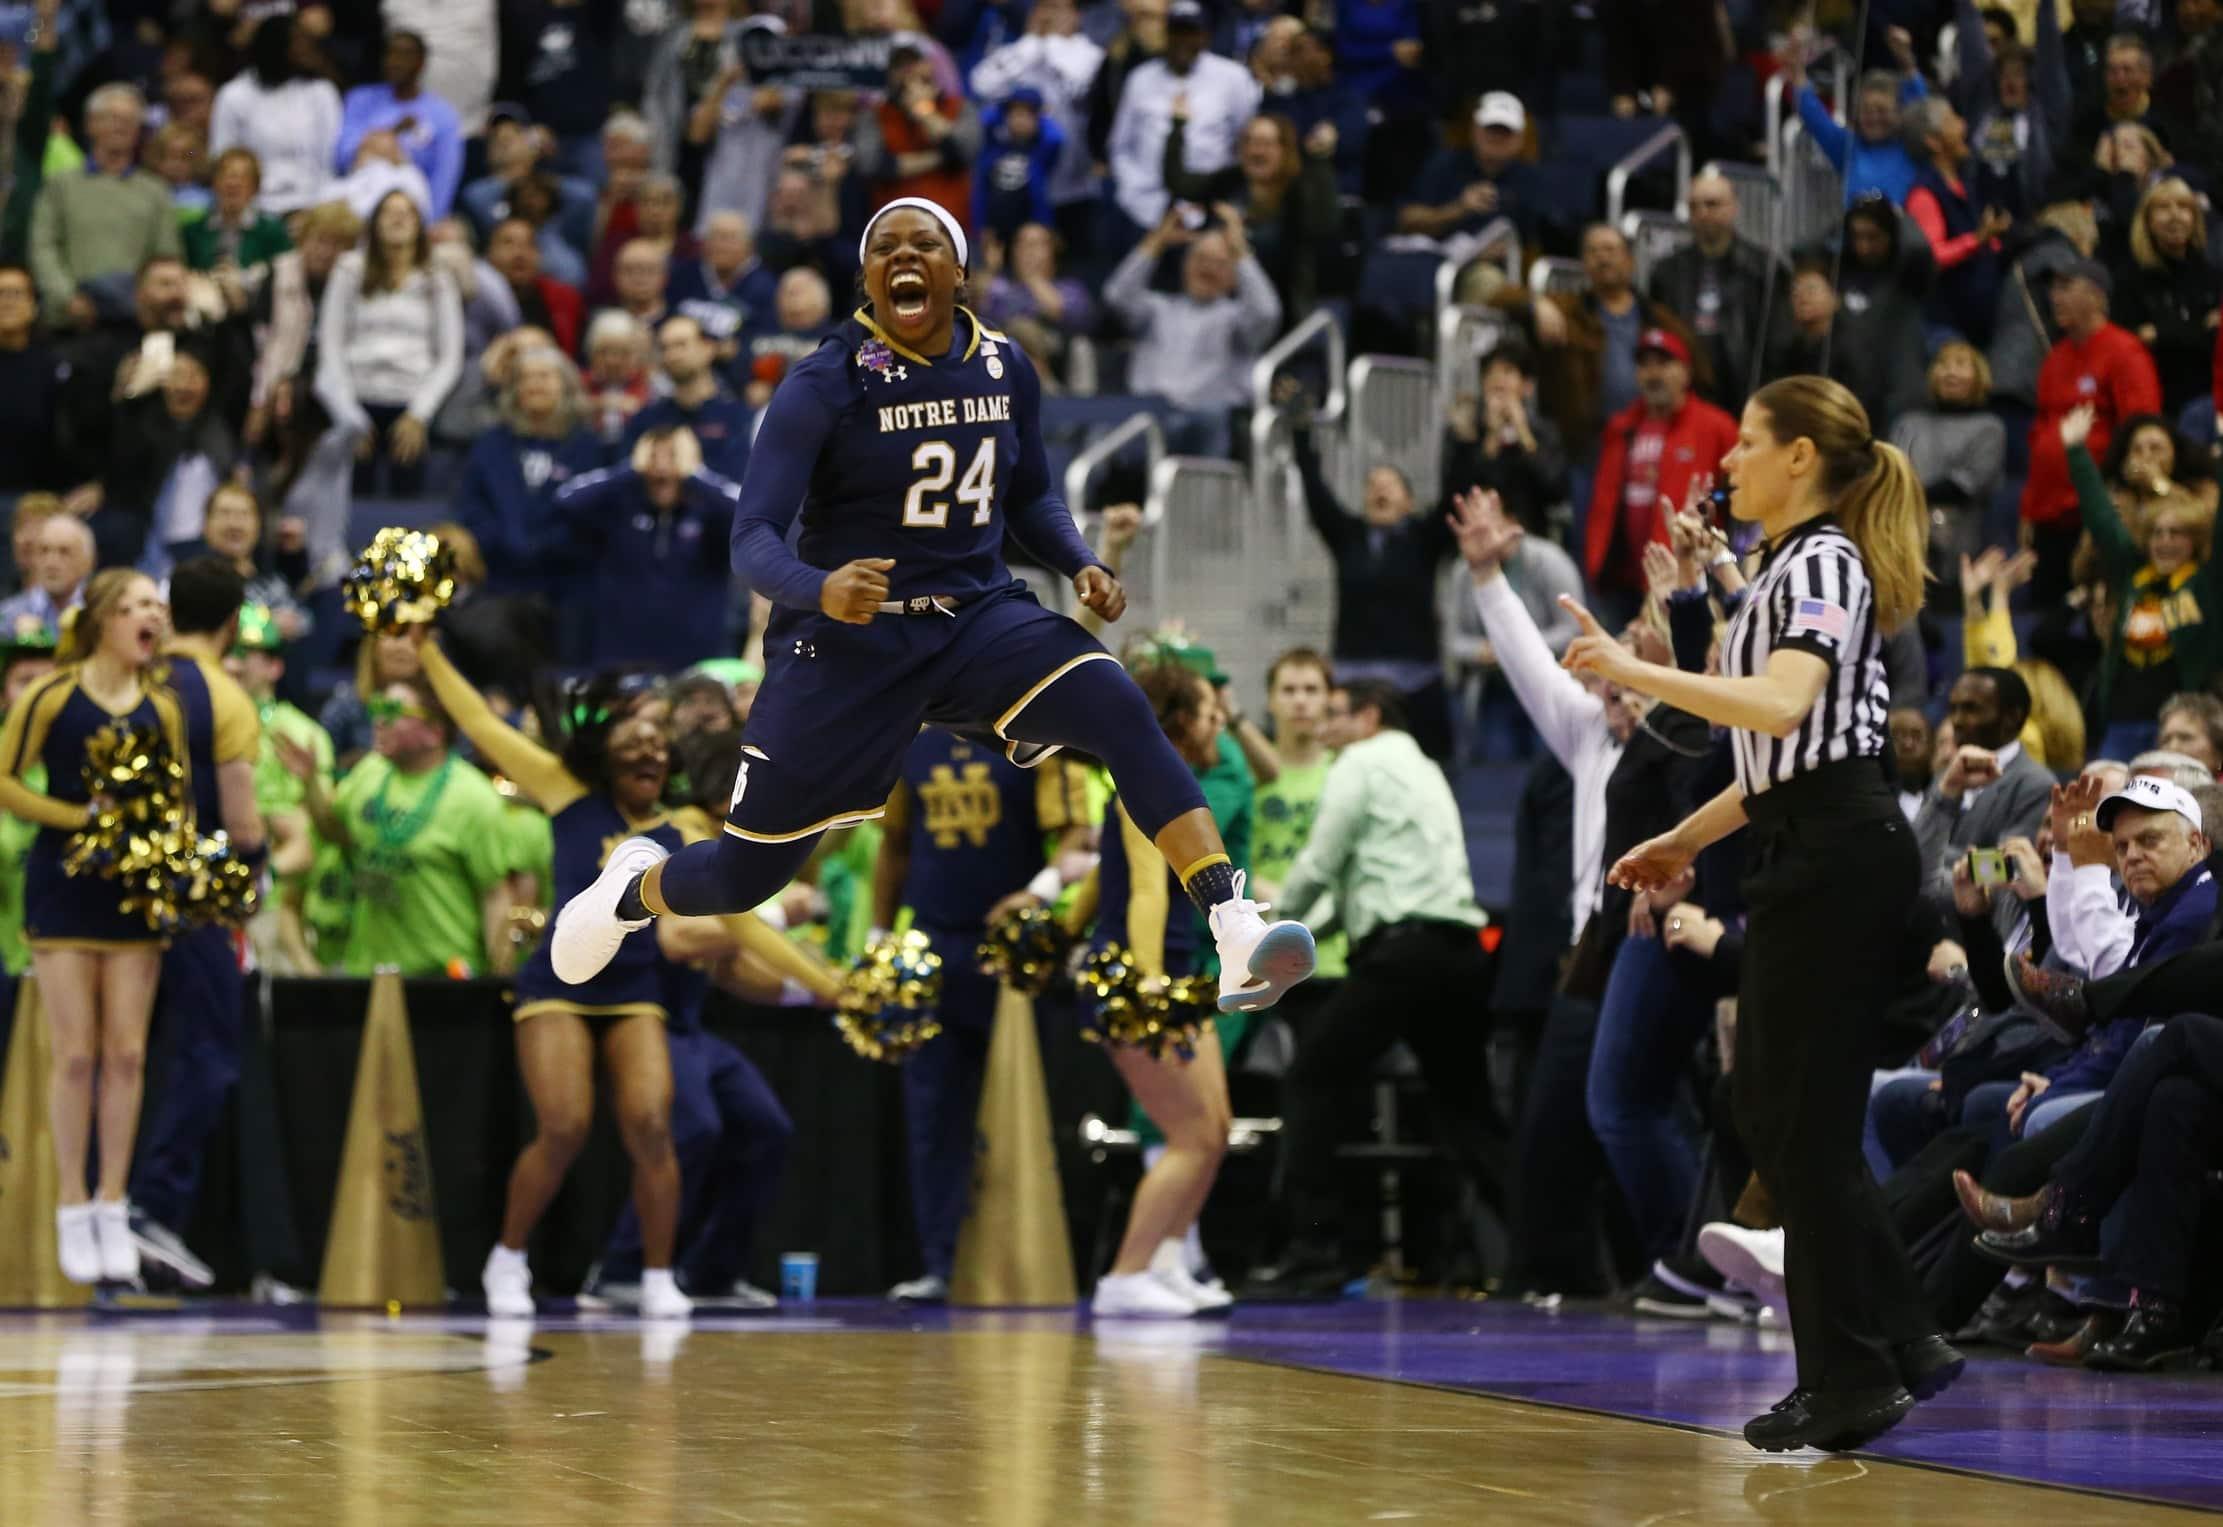 Notre Dame Basketball Arena